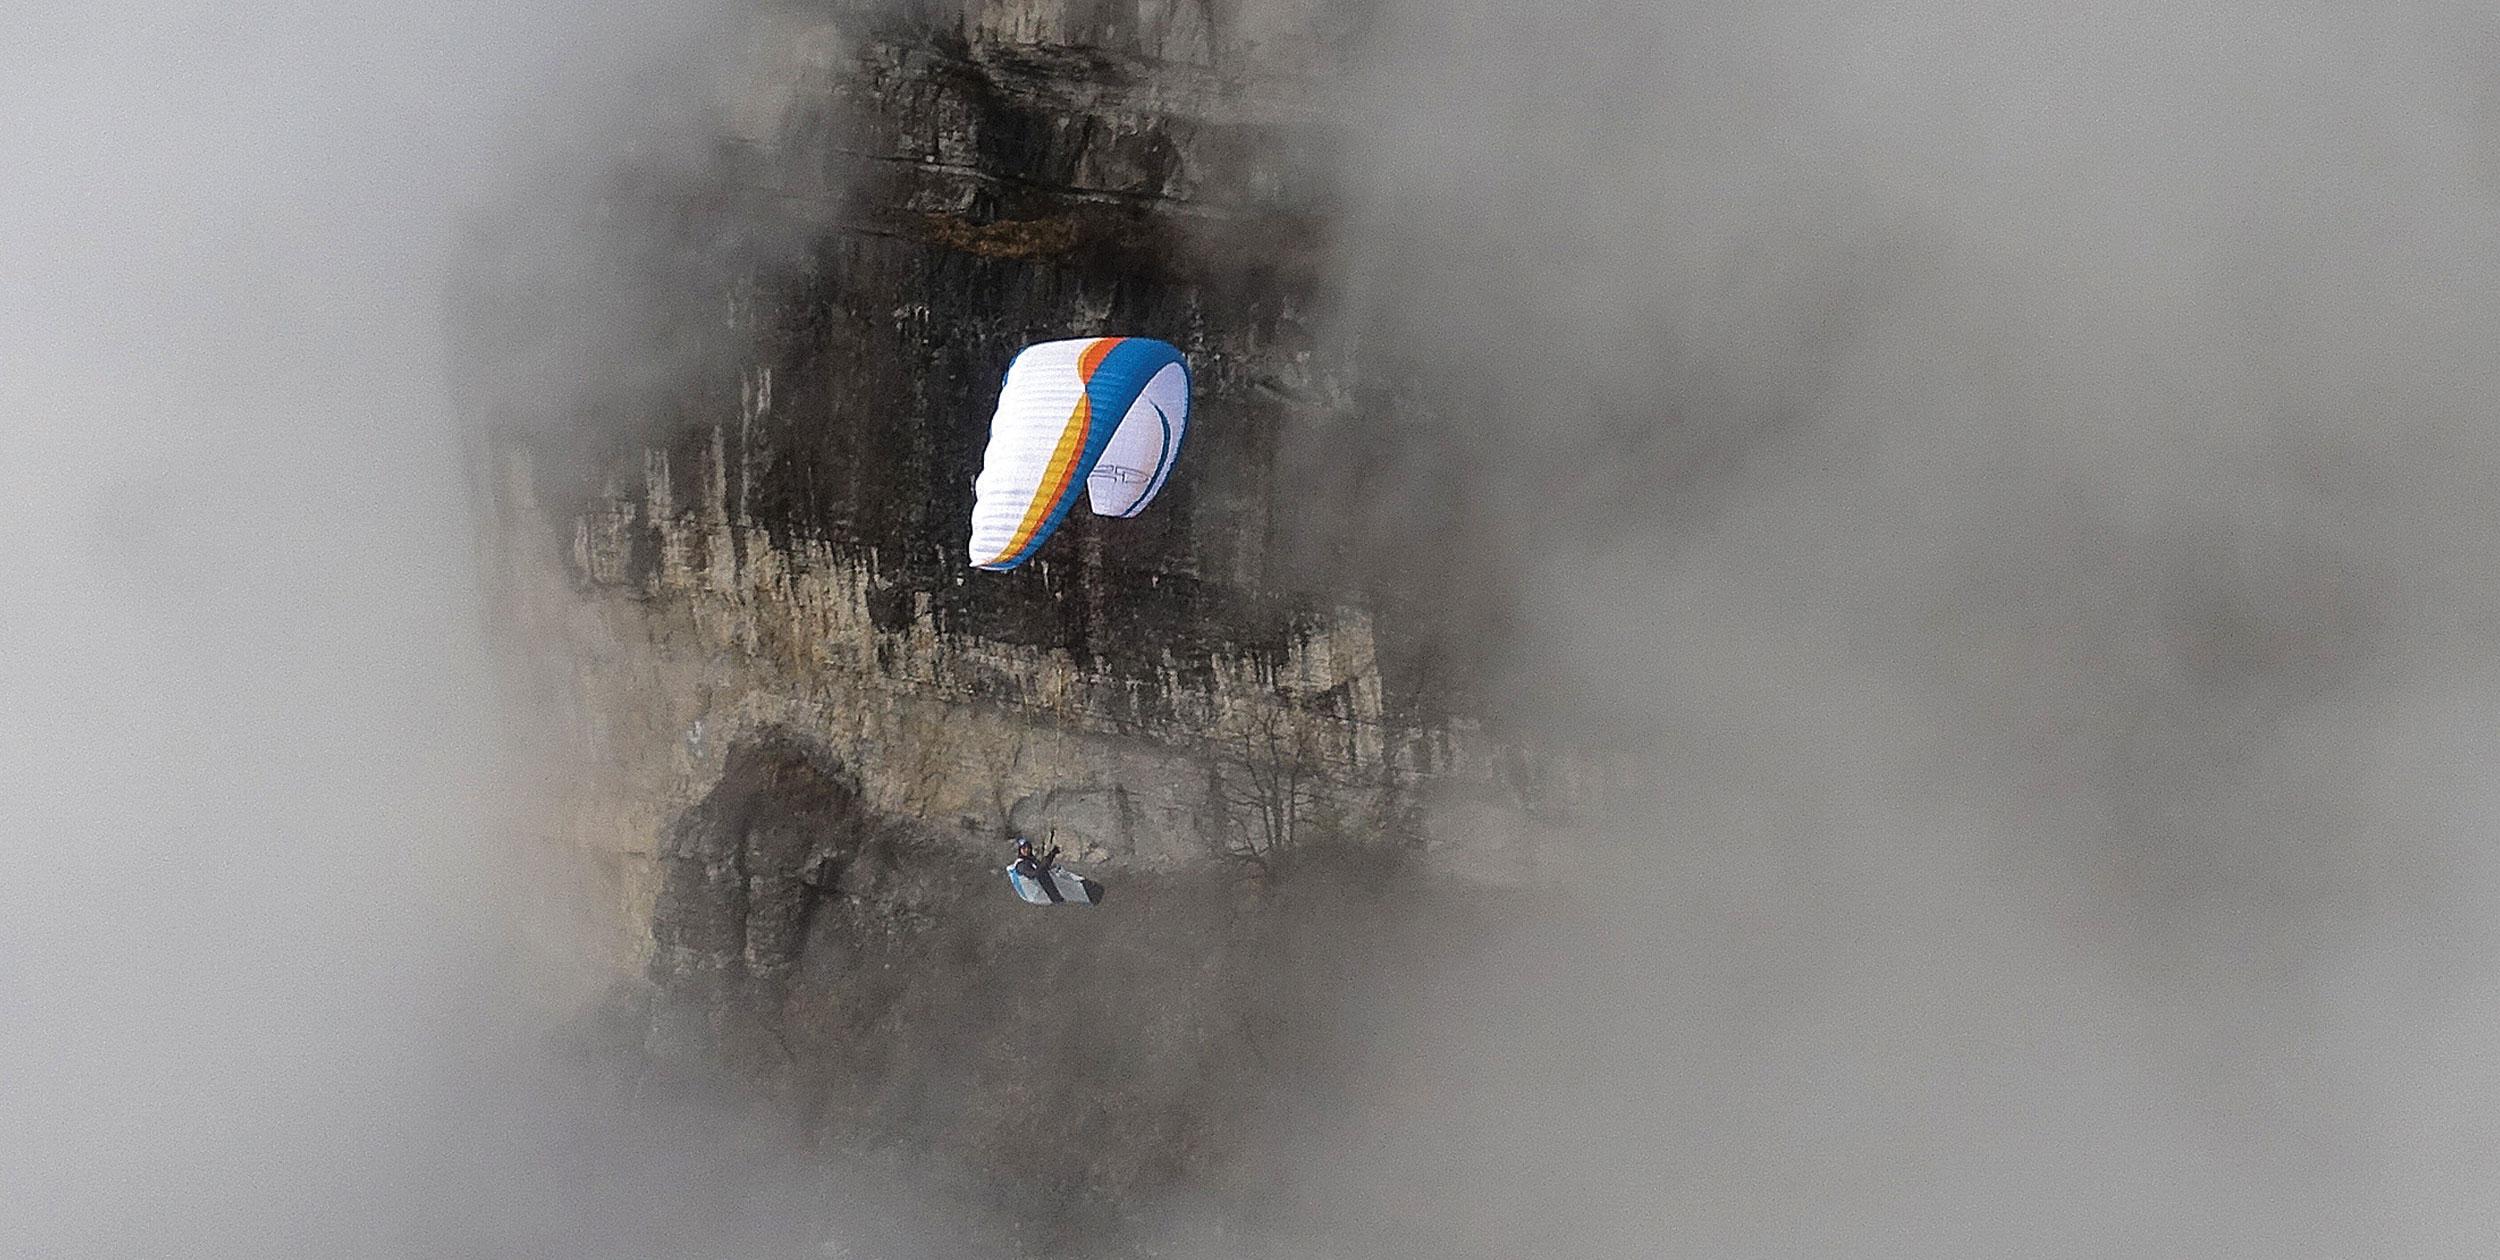 Paraglider in cloud